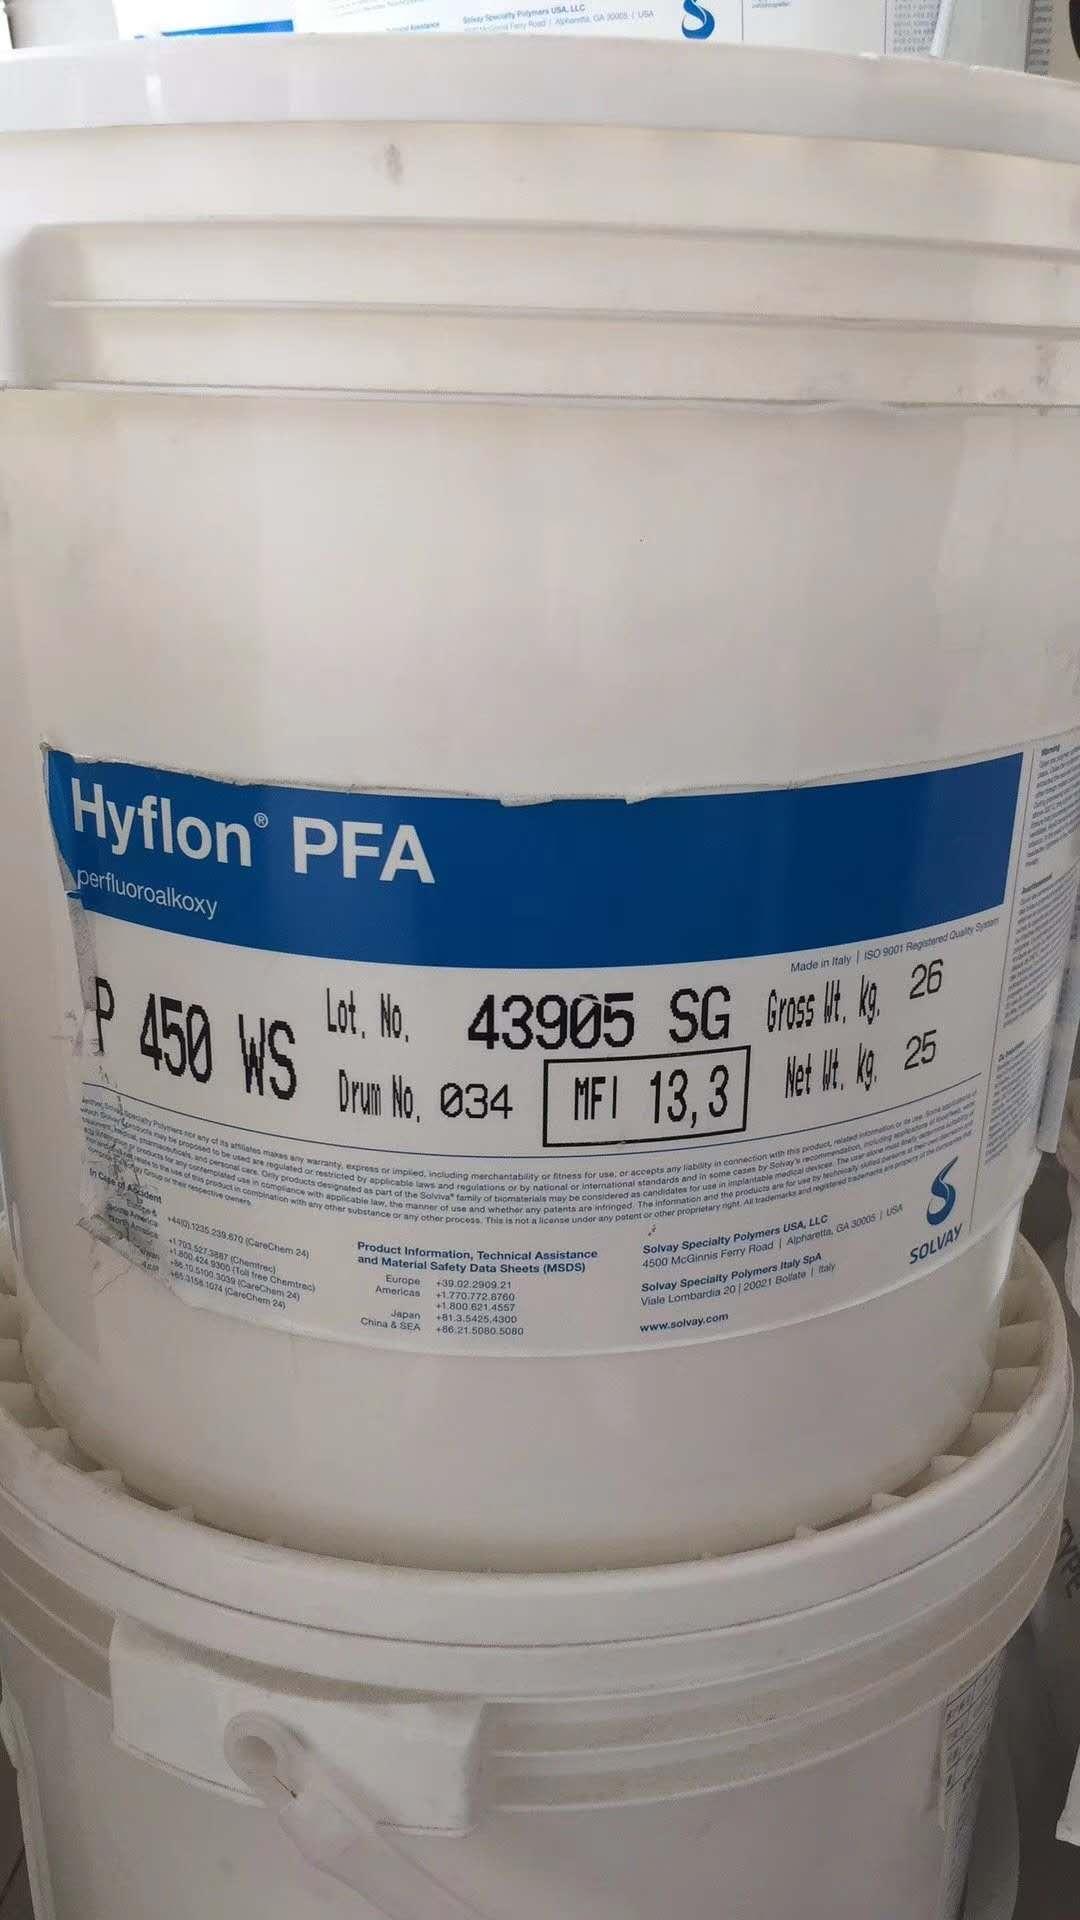 Hyflon PFA P450 WS